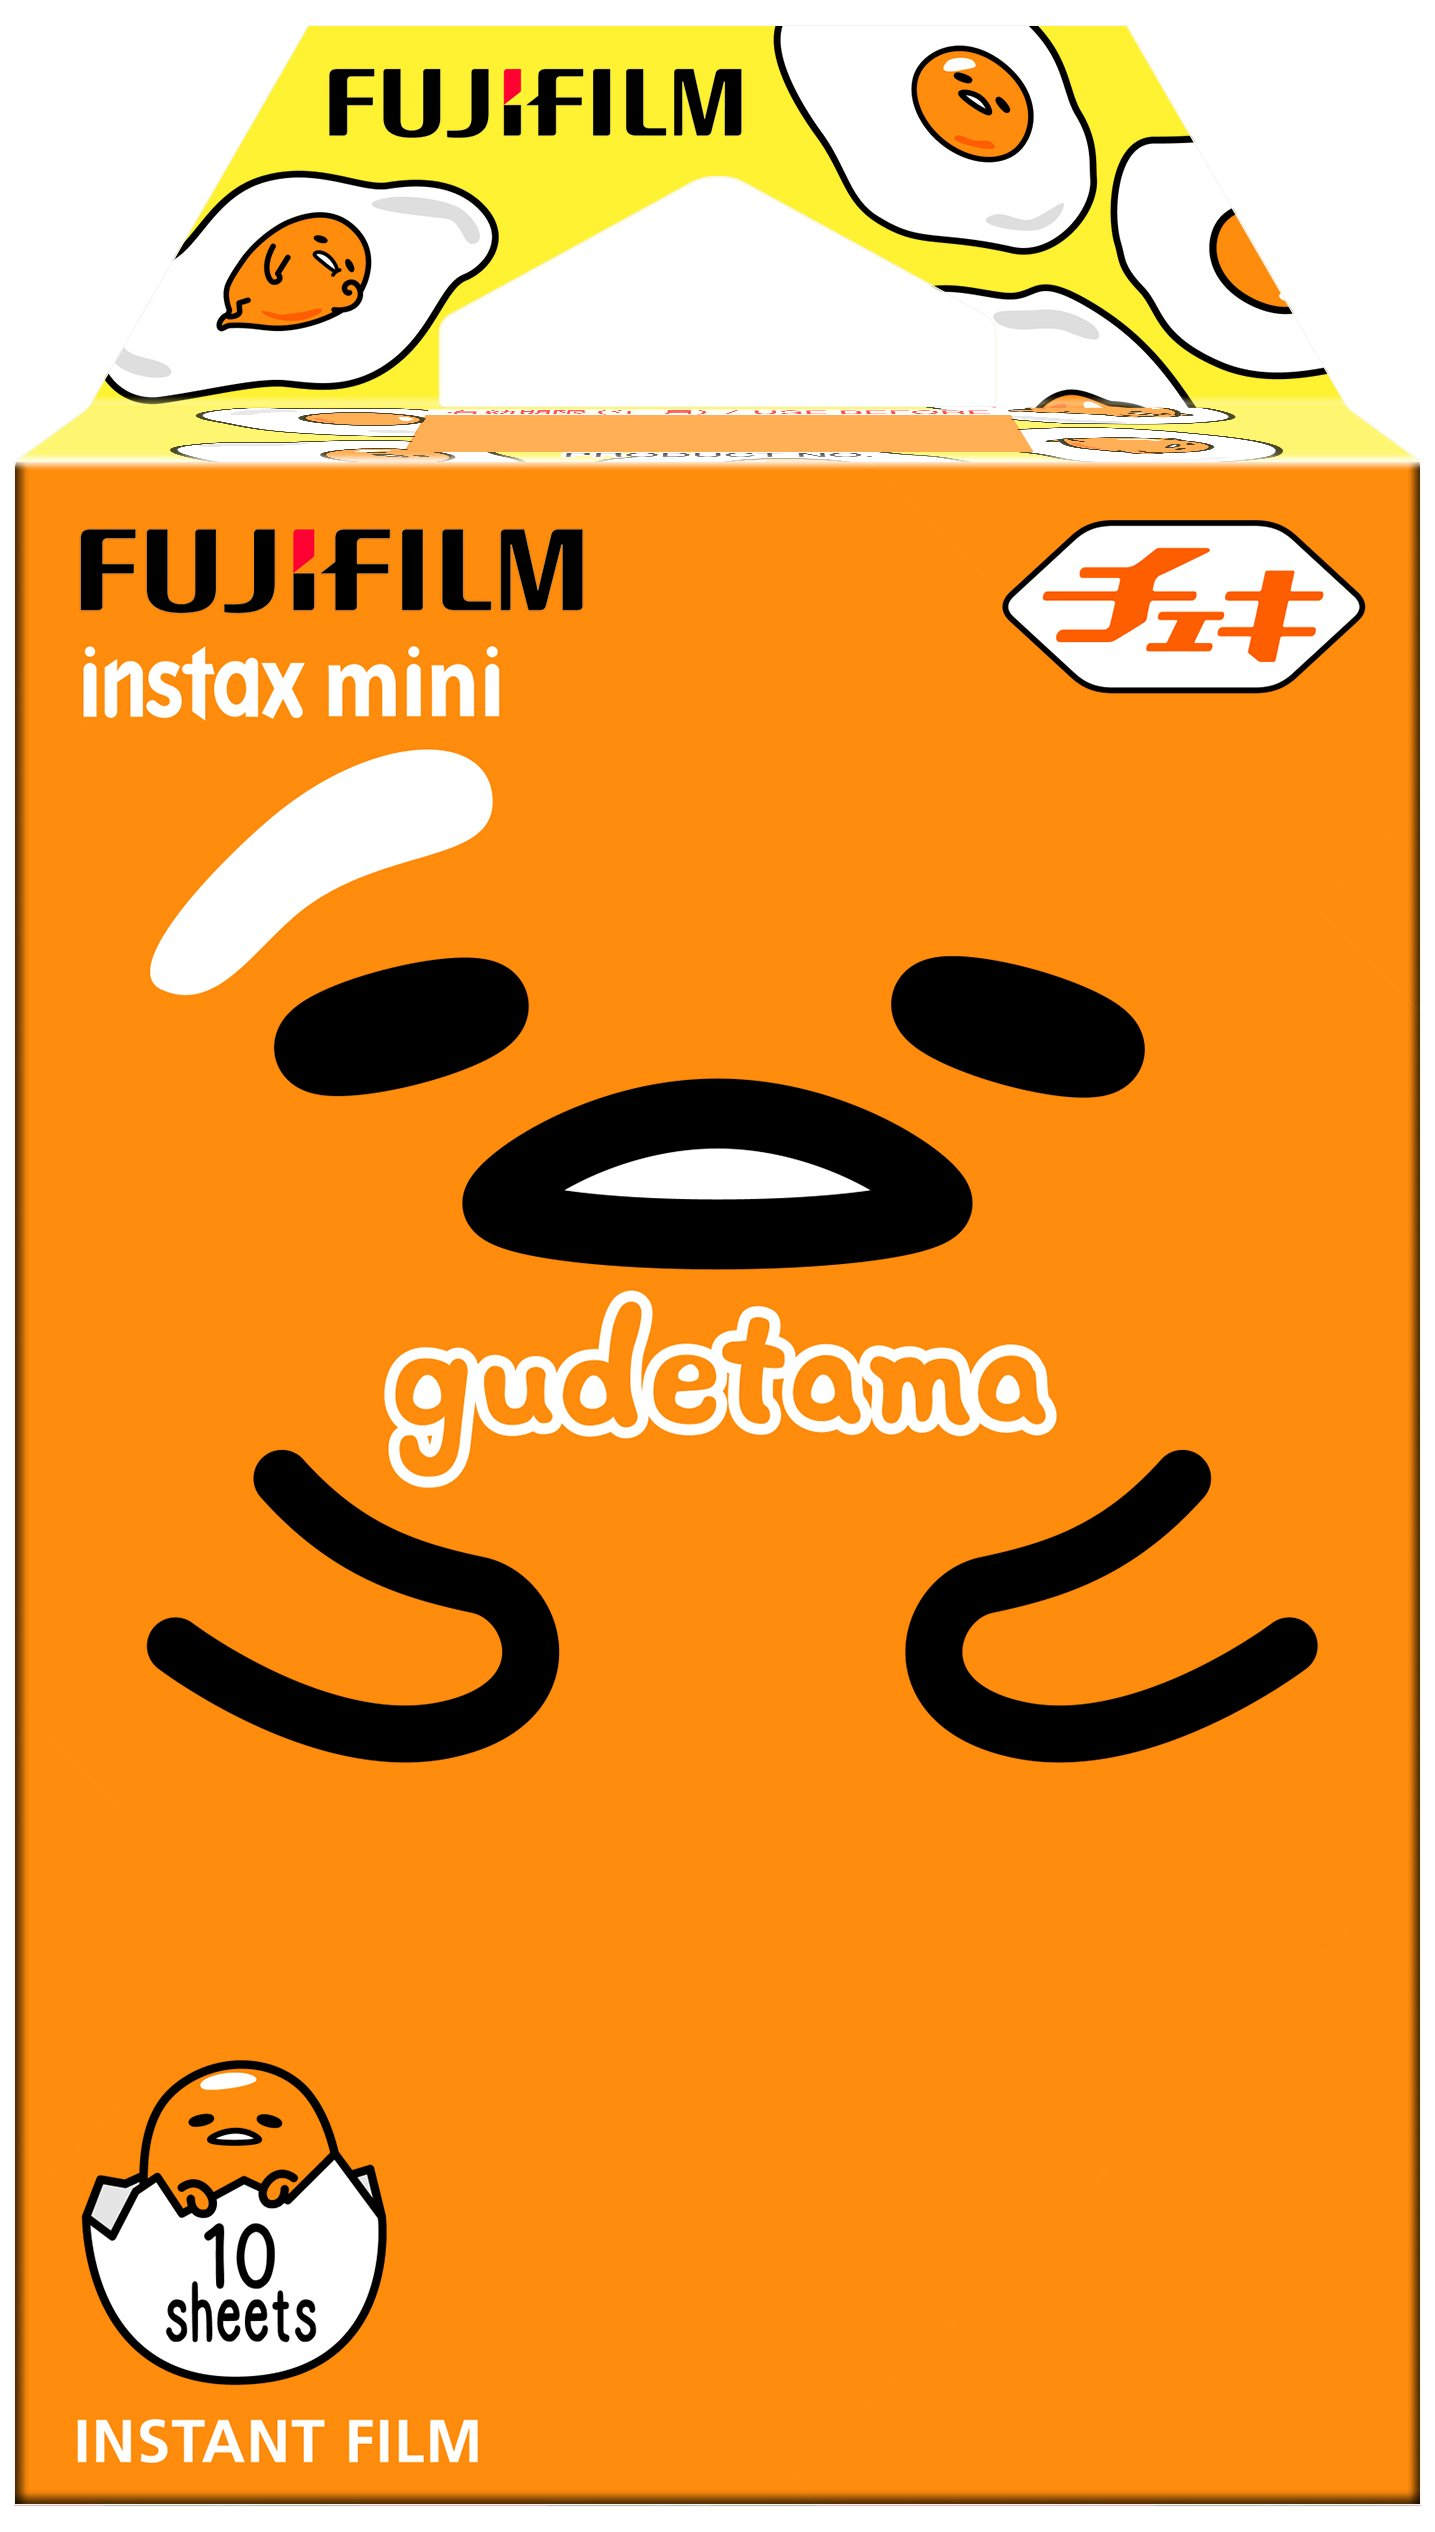 Fujifilm Instax Mini Instant Film (10 sheets, Sanrio Gudetama 2017 Edition)